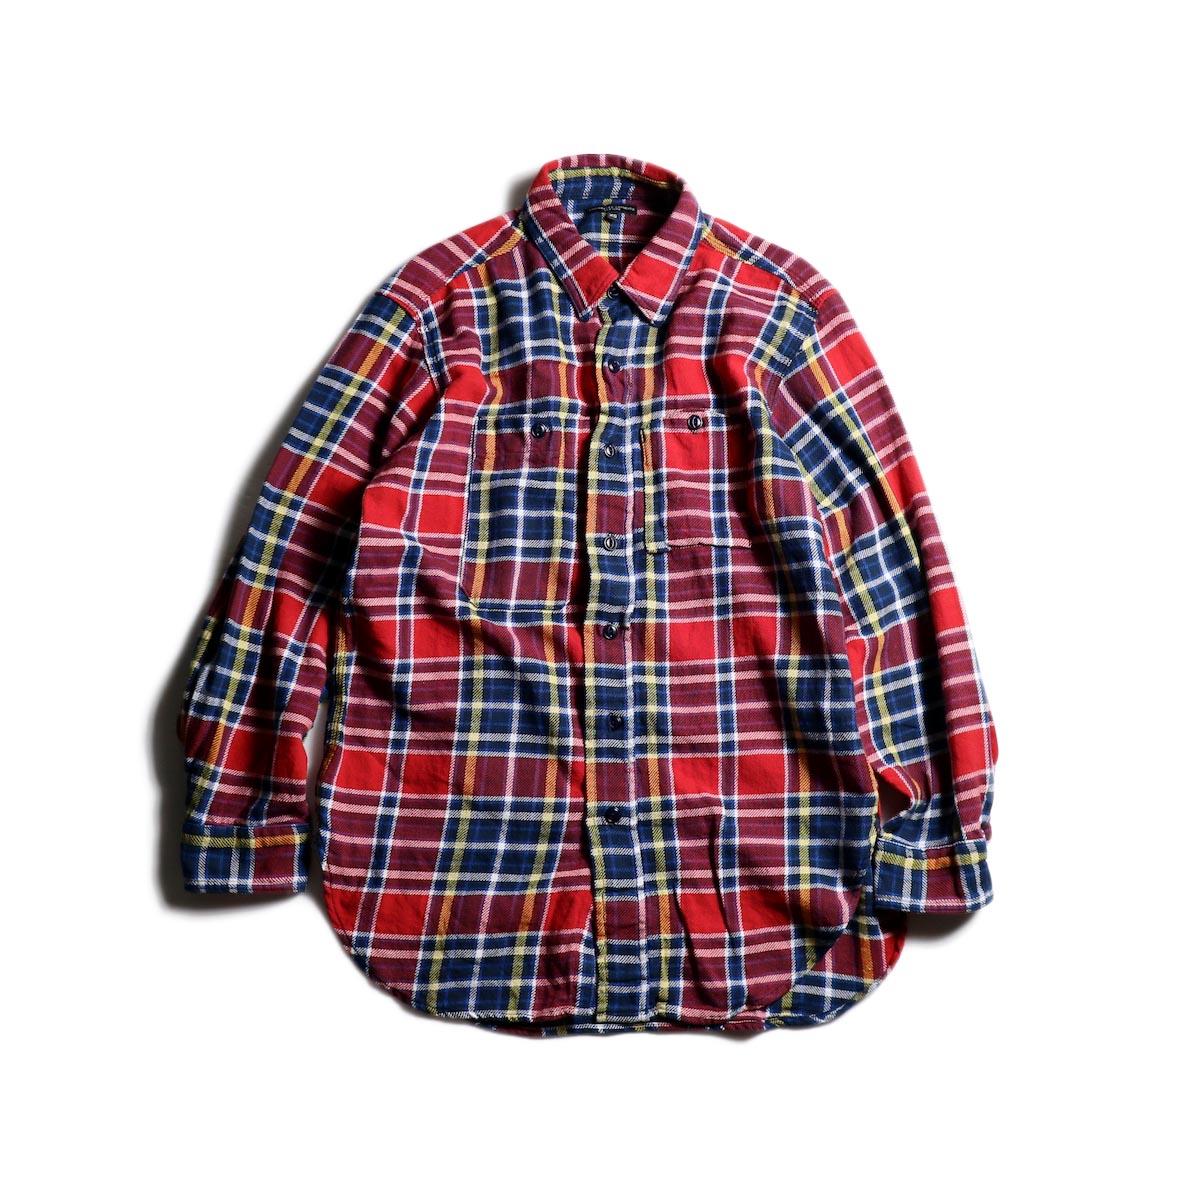 Engineered Garments / Work Shirt -Twill Plaid (Red/Navy)